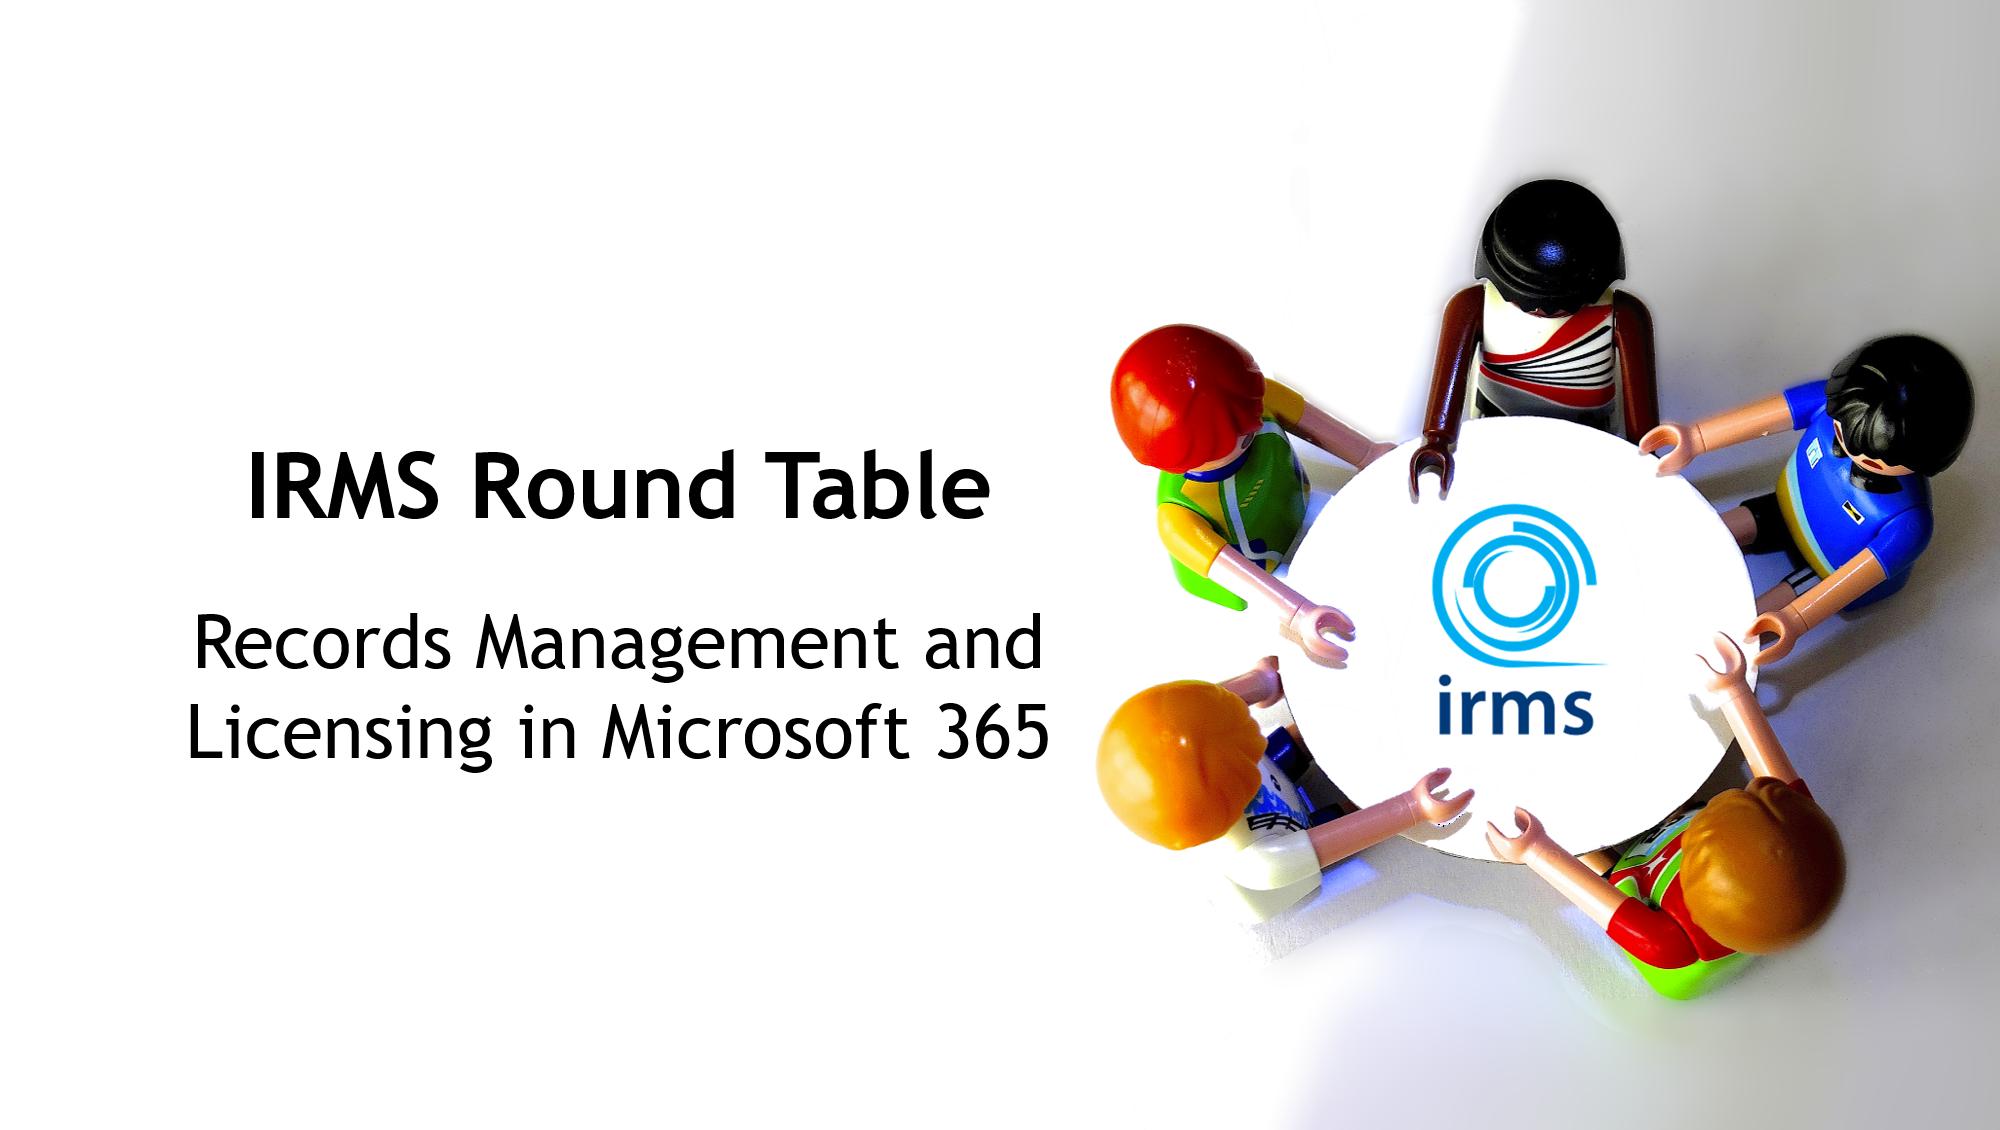 IRMS Round Table